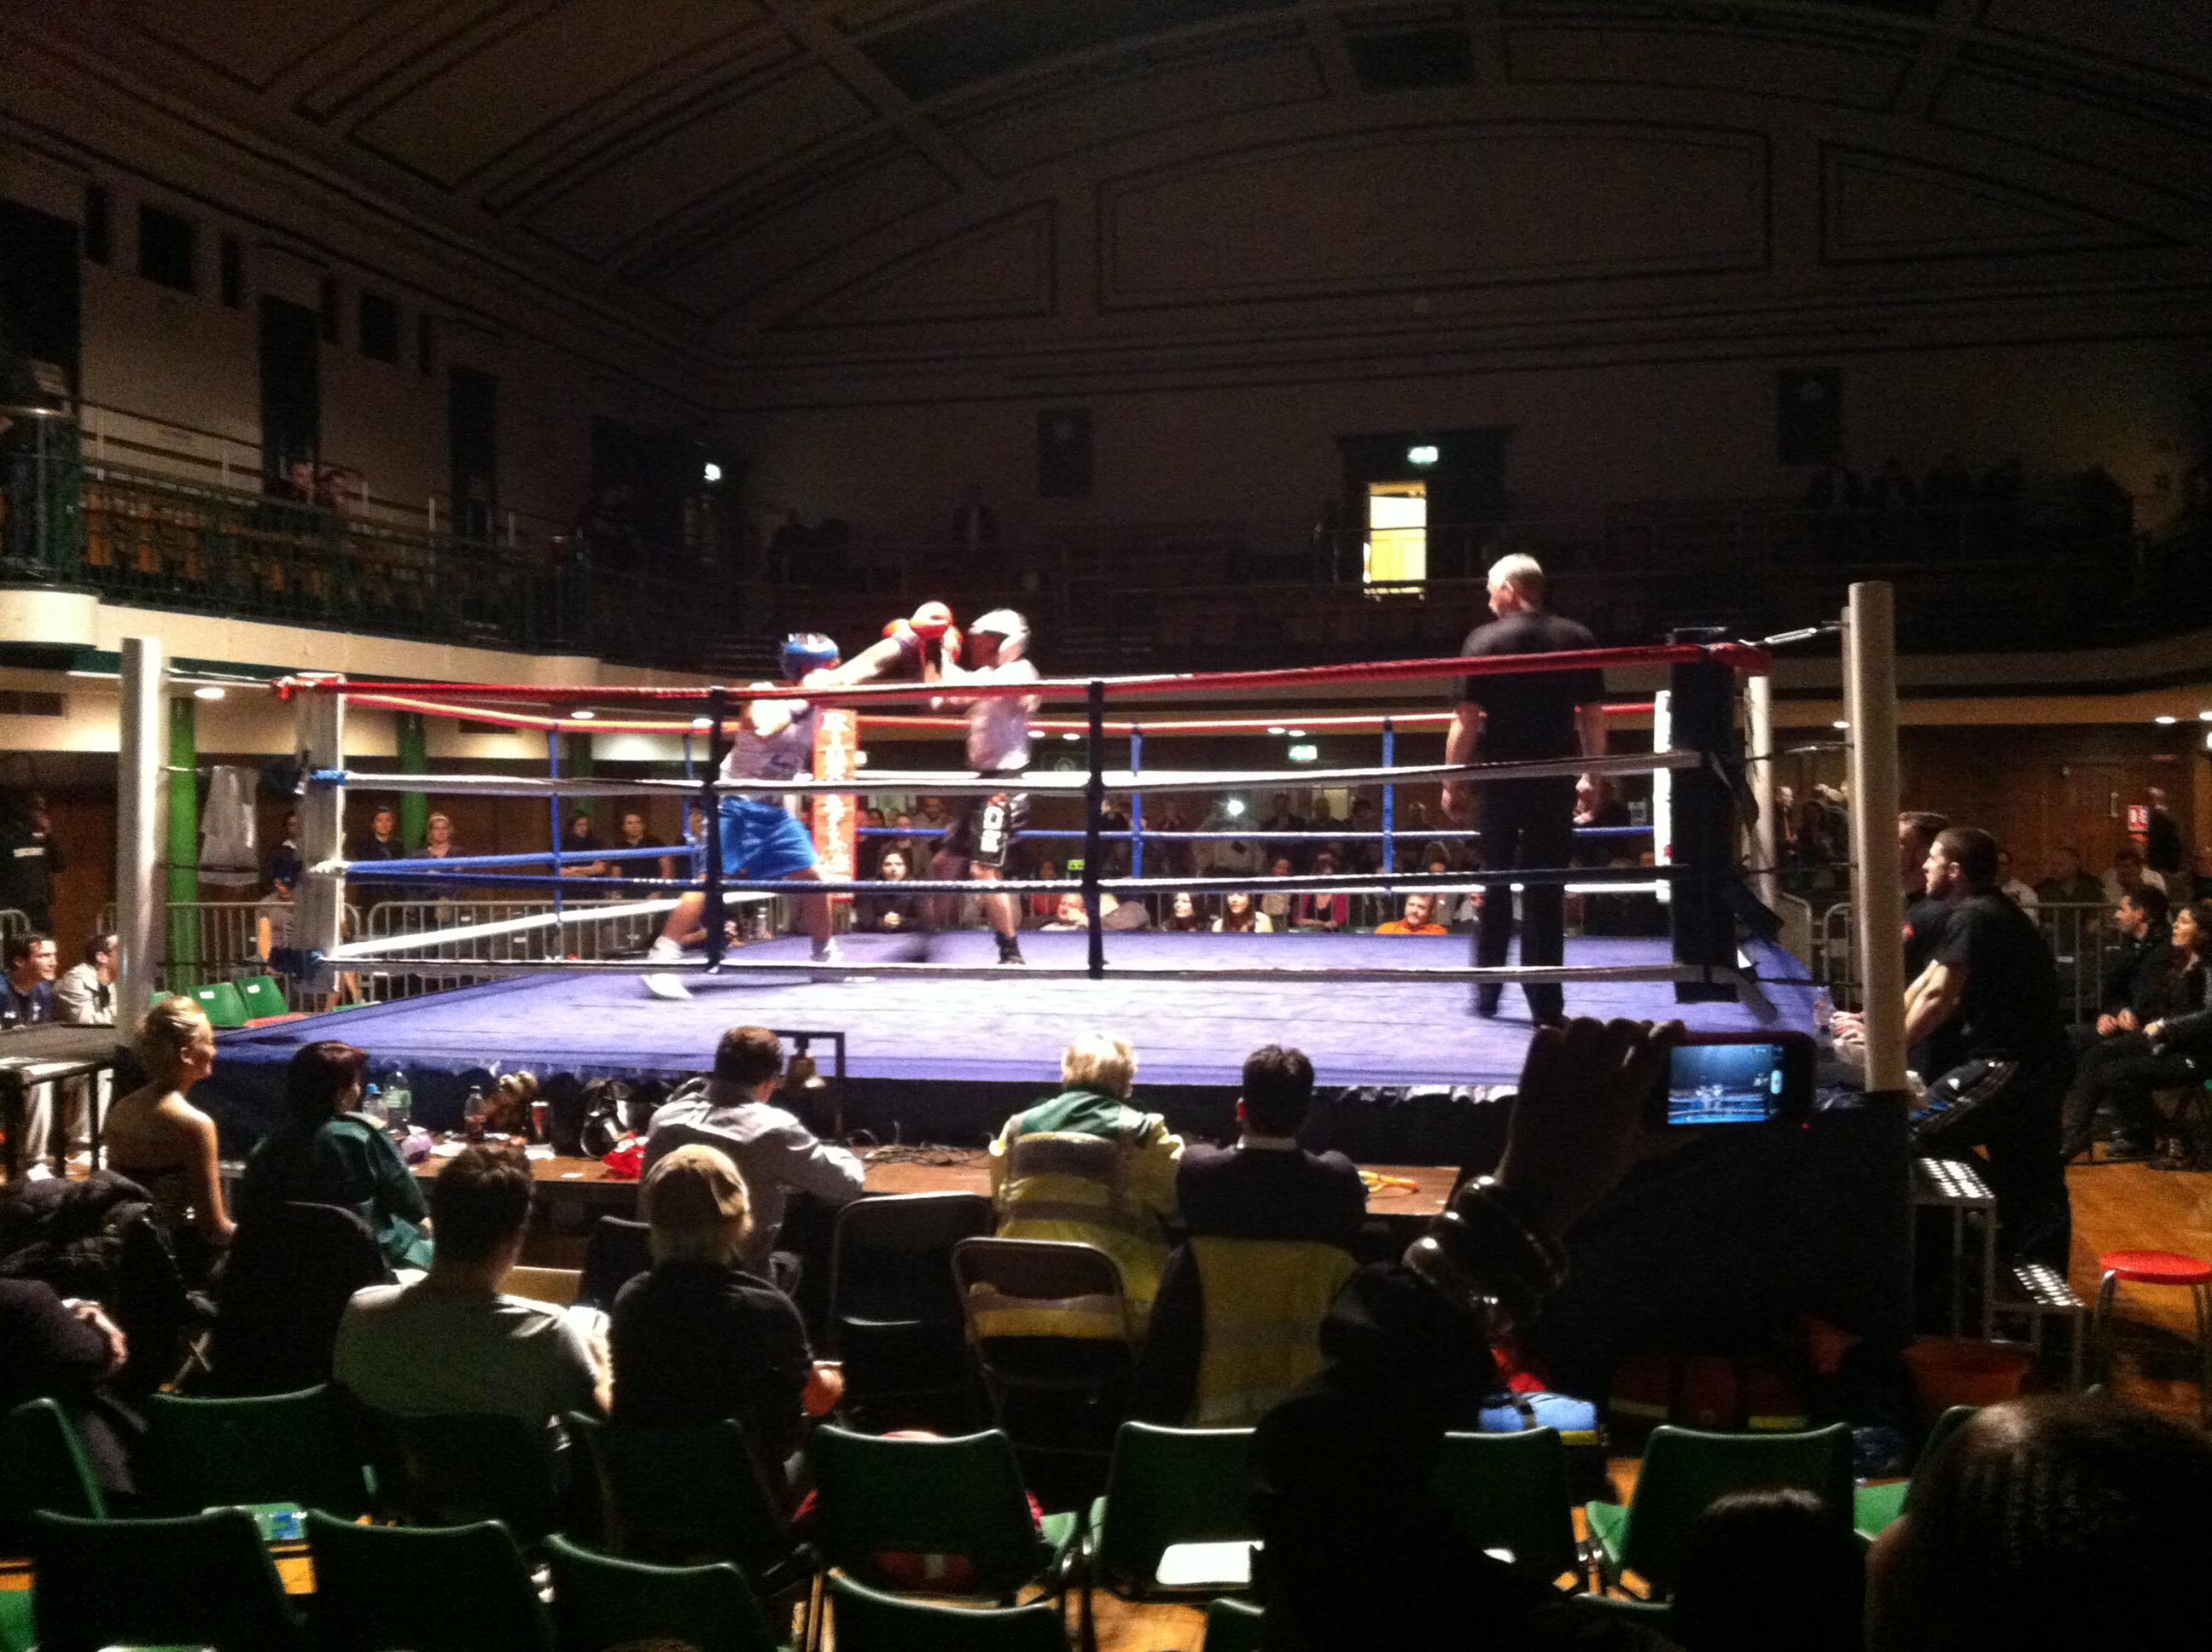 White Collar Boxing York Hall - David Johnson